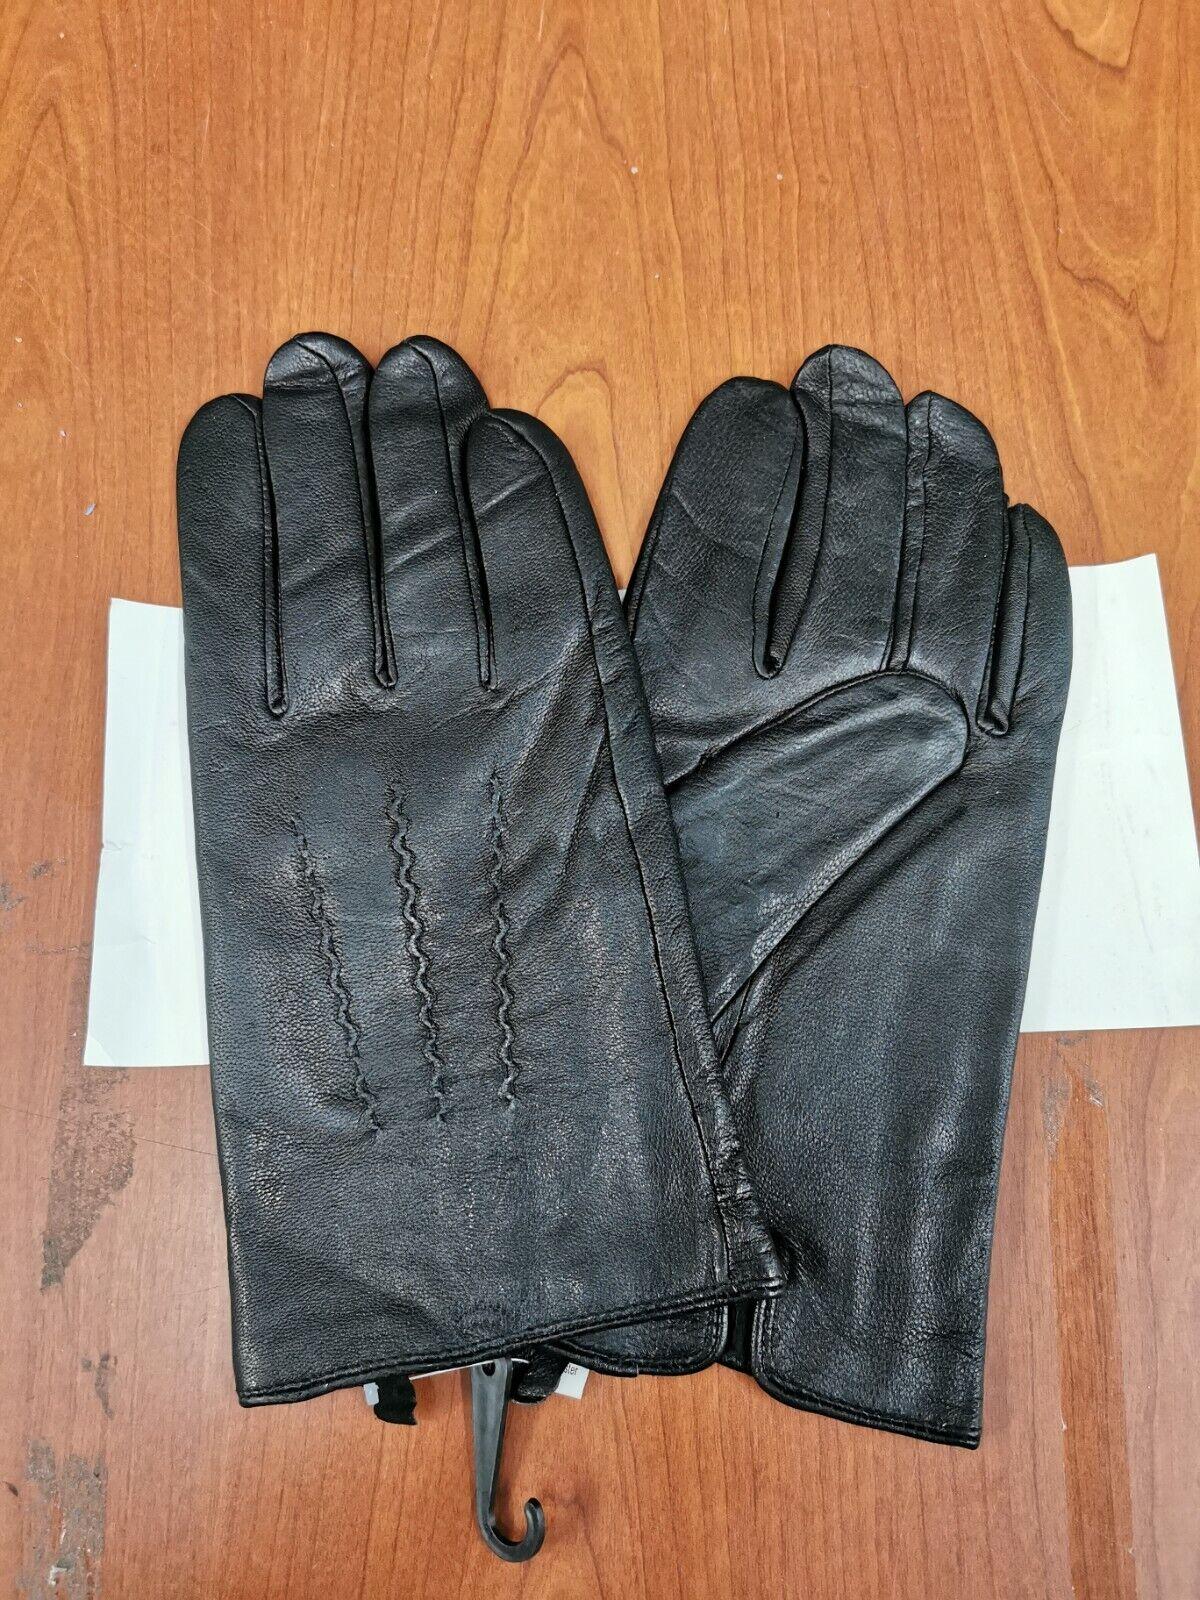 Black Leather Gloves Men's Medium